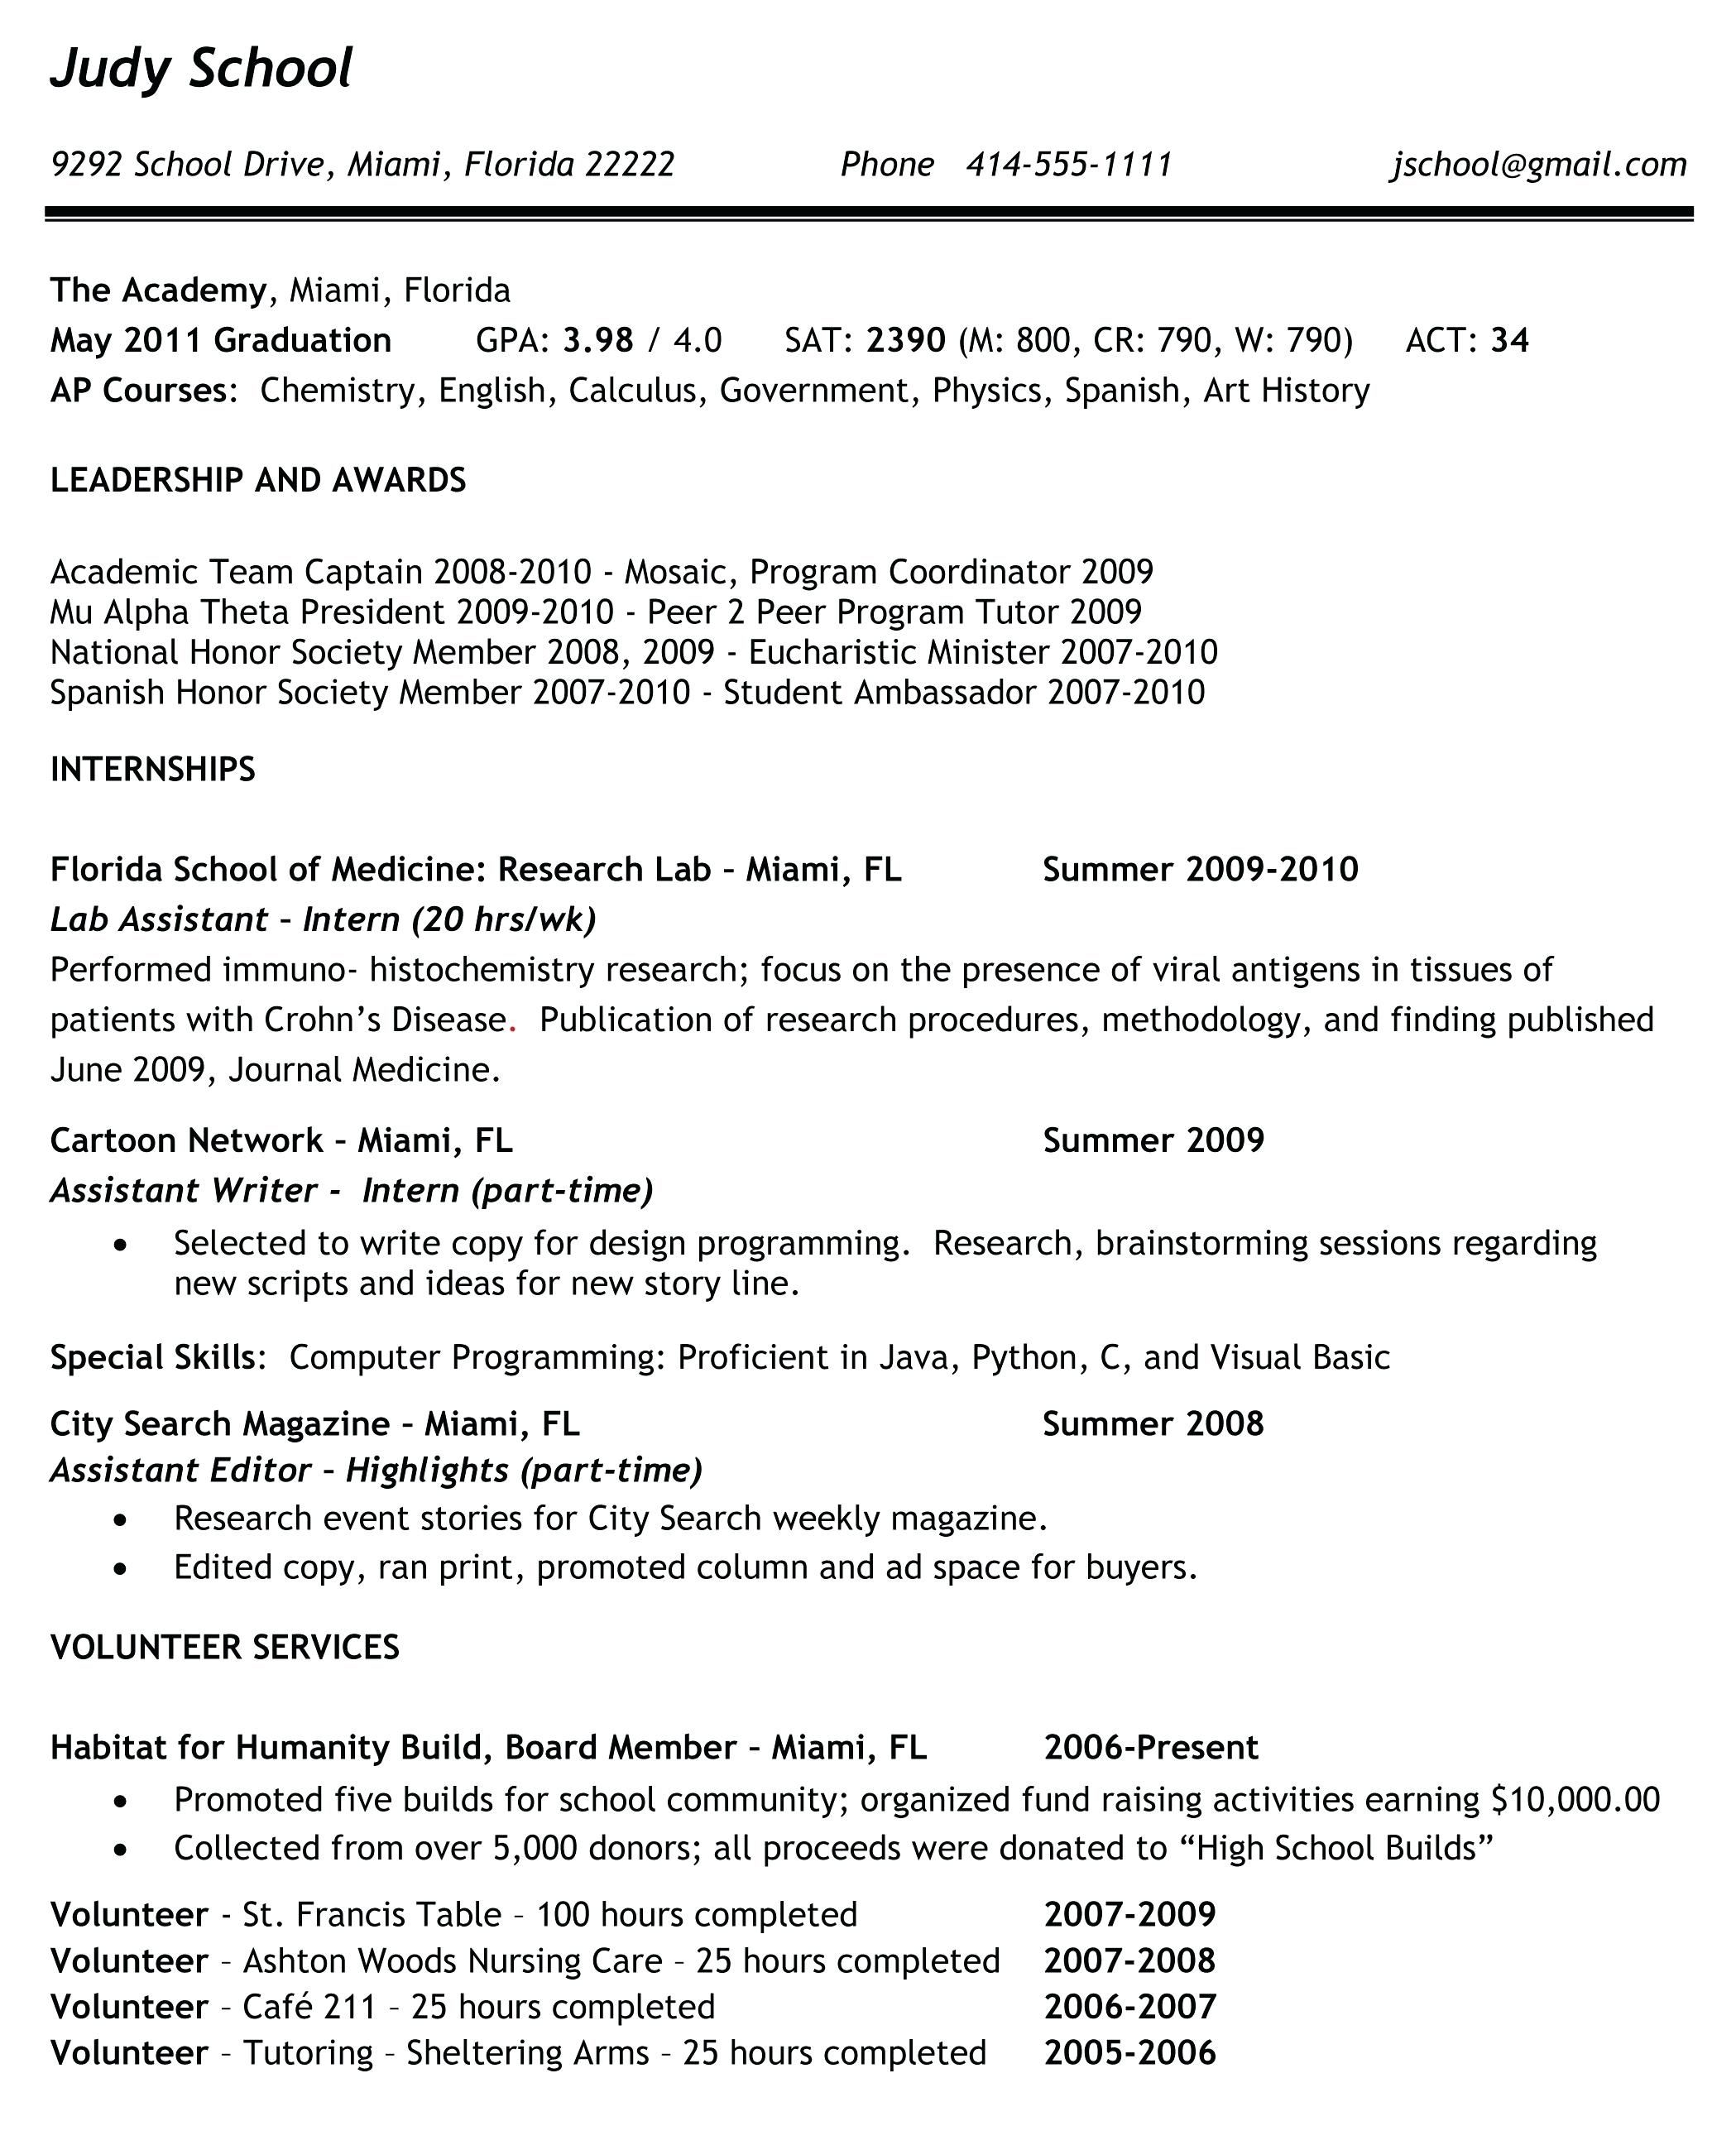 Sample Senior Brag Sheet  College resume template, College resume